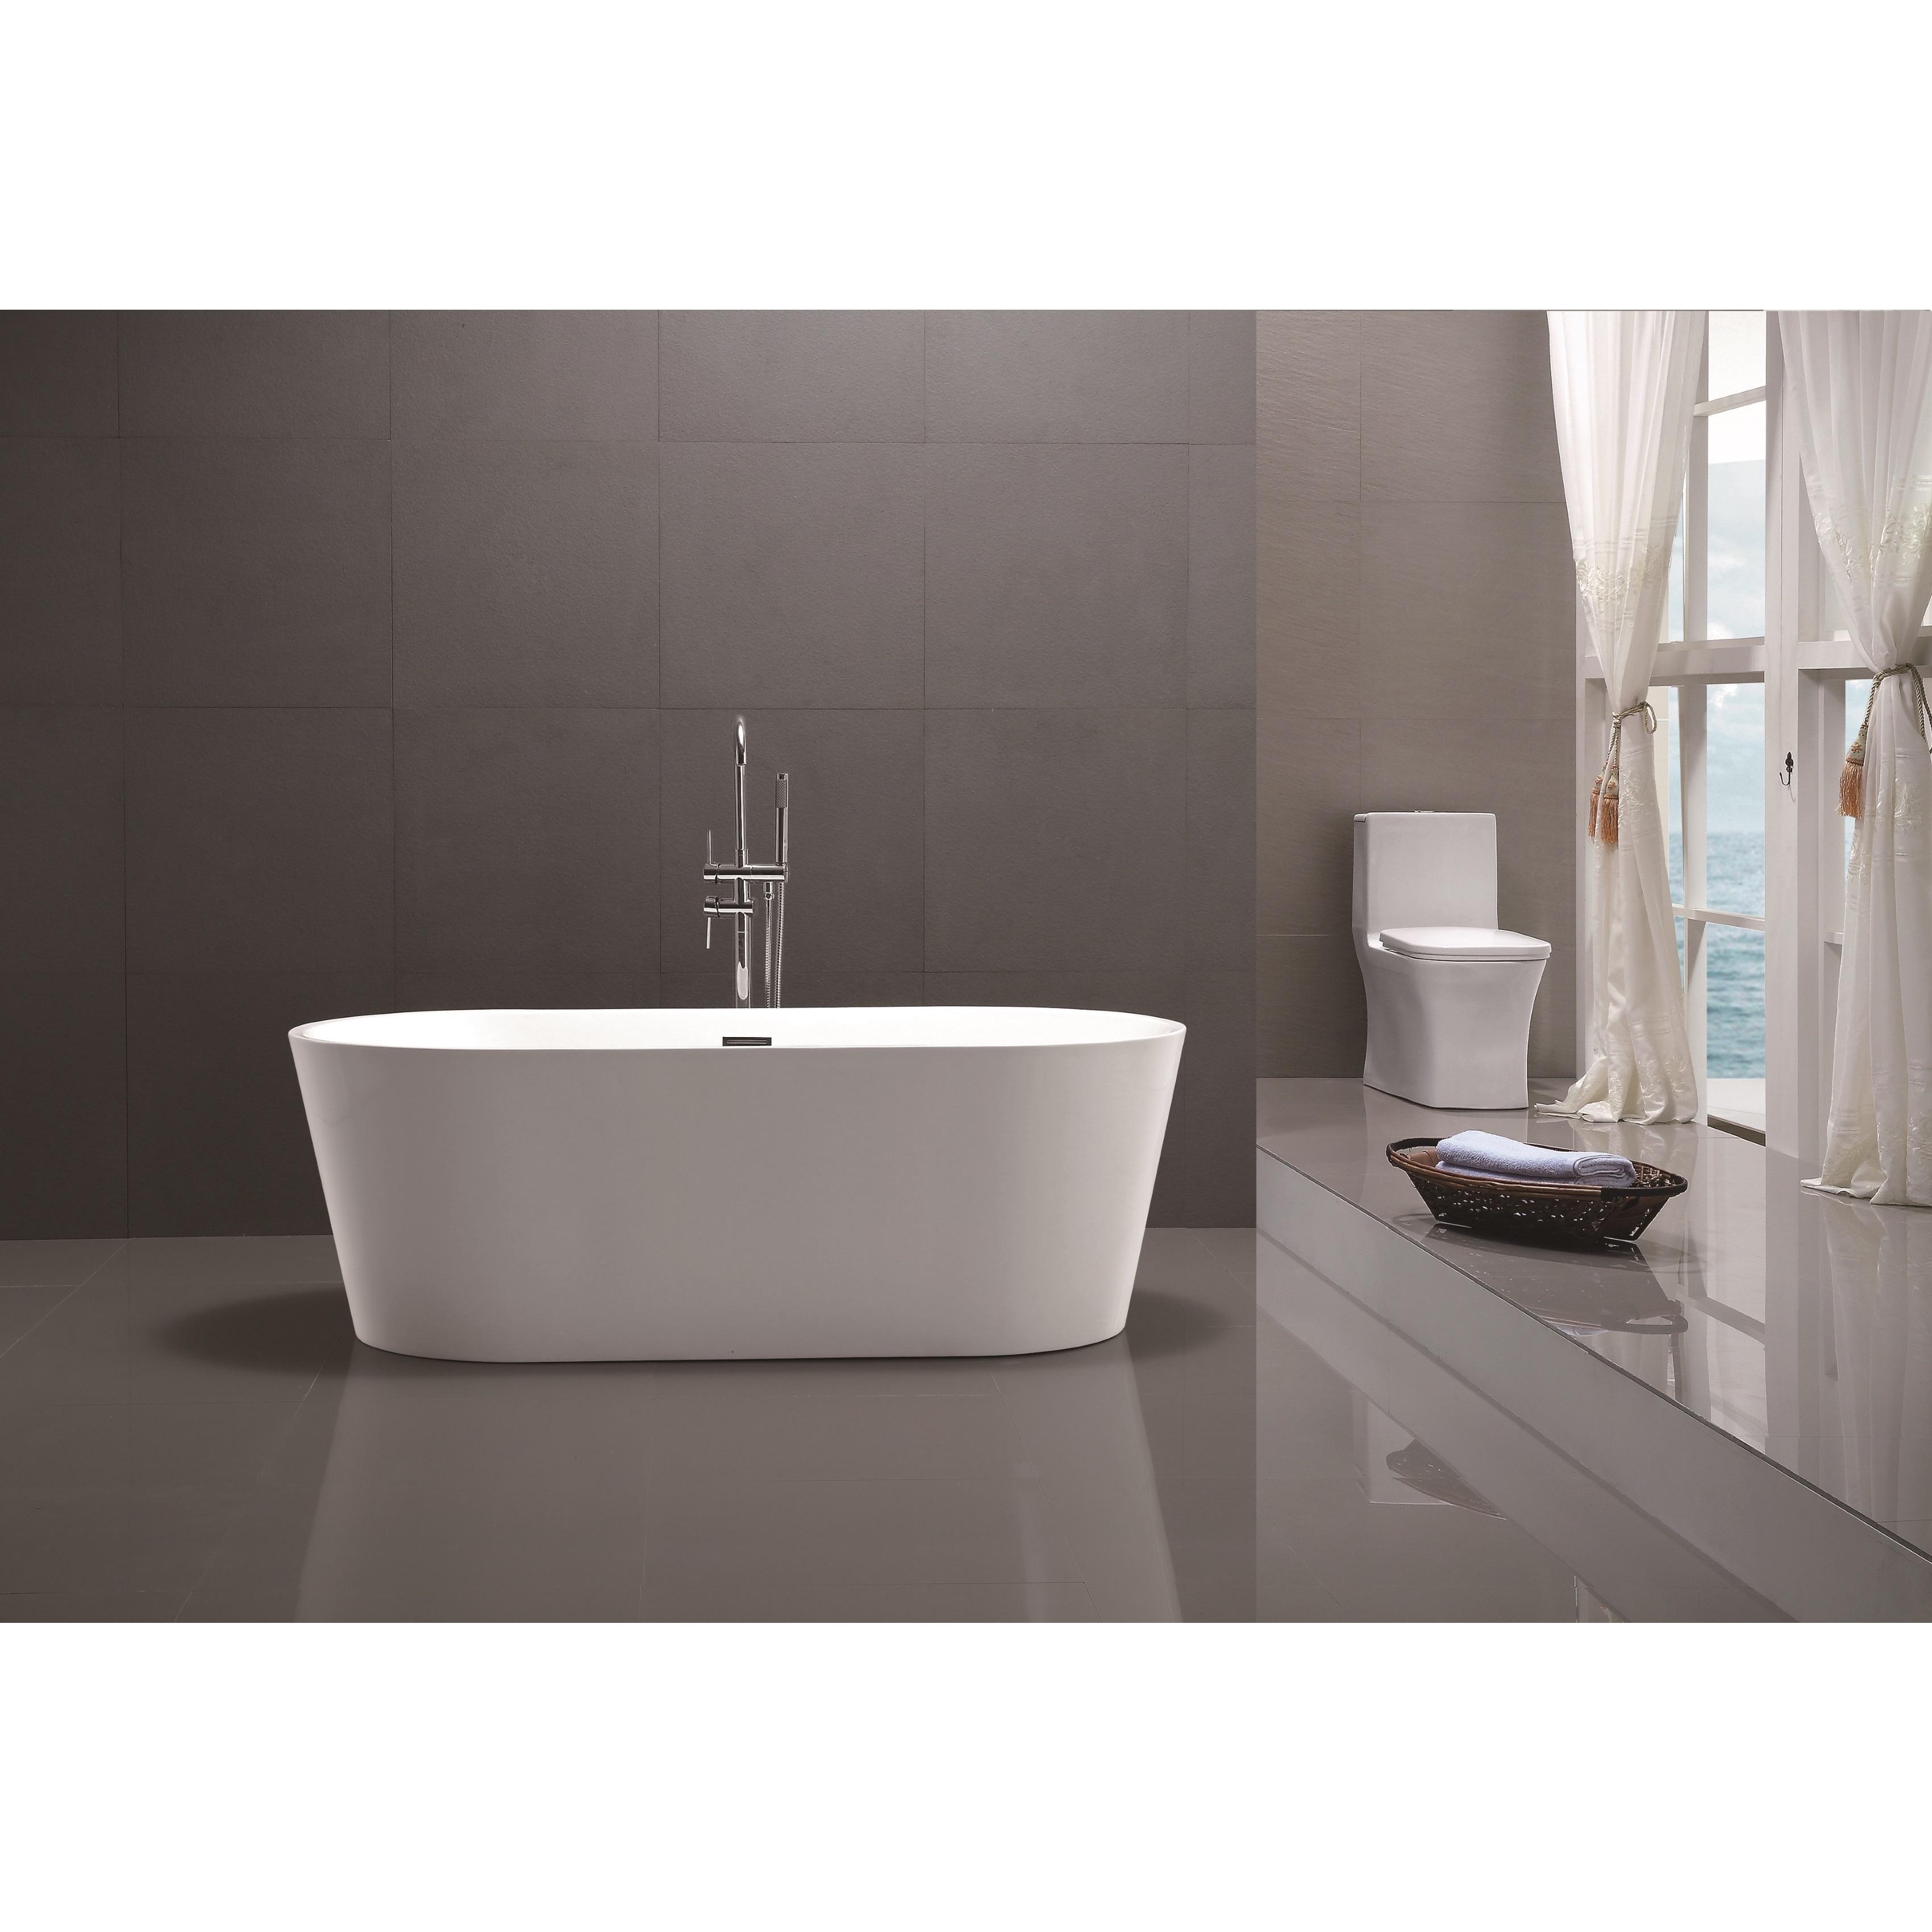 Shop Vanity Art 59 Inch Freestanding White Acrylic Soaking Bathtub